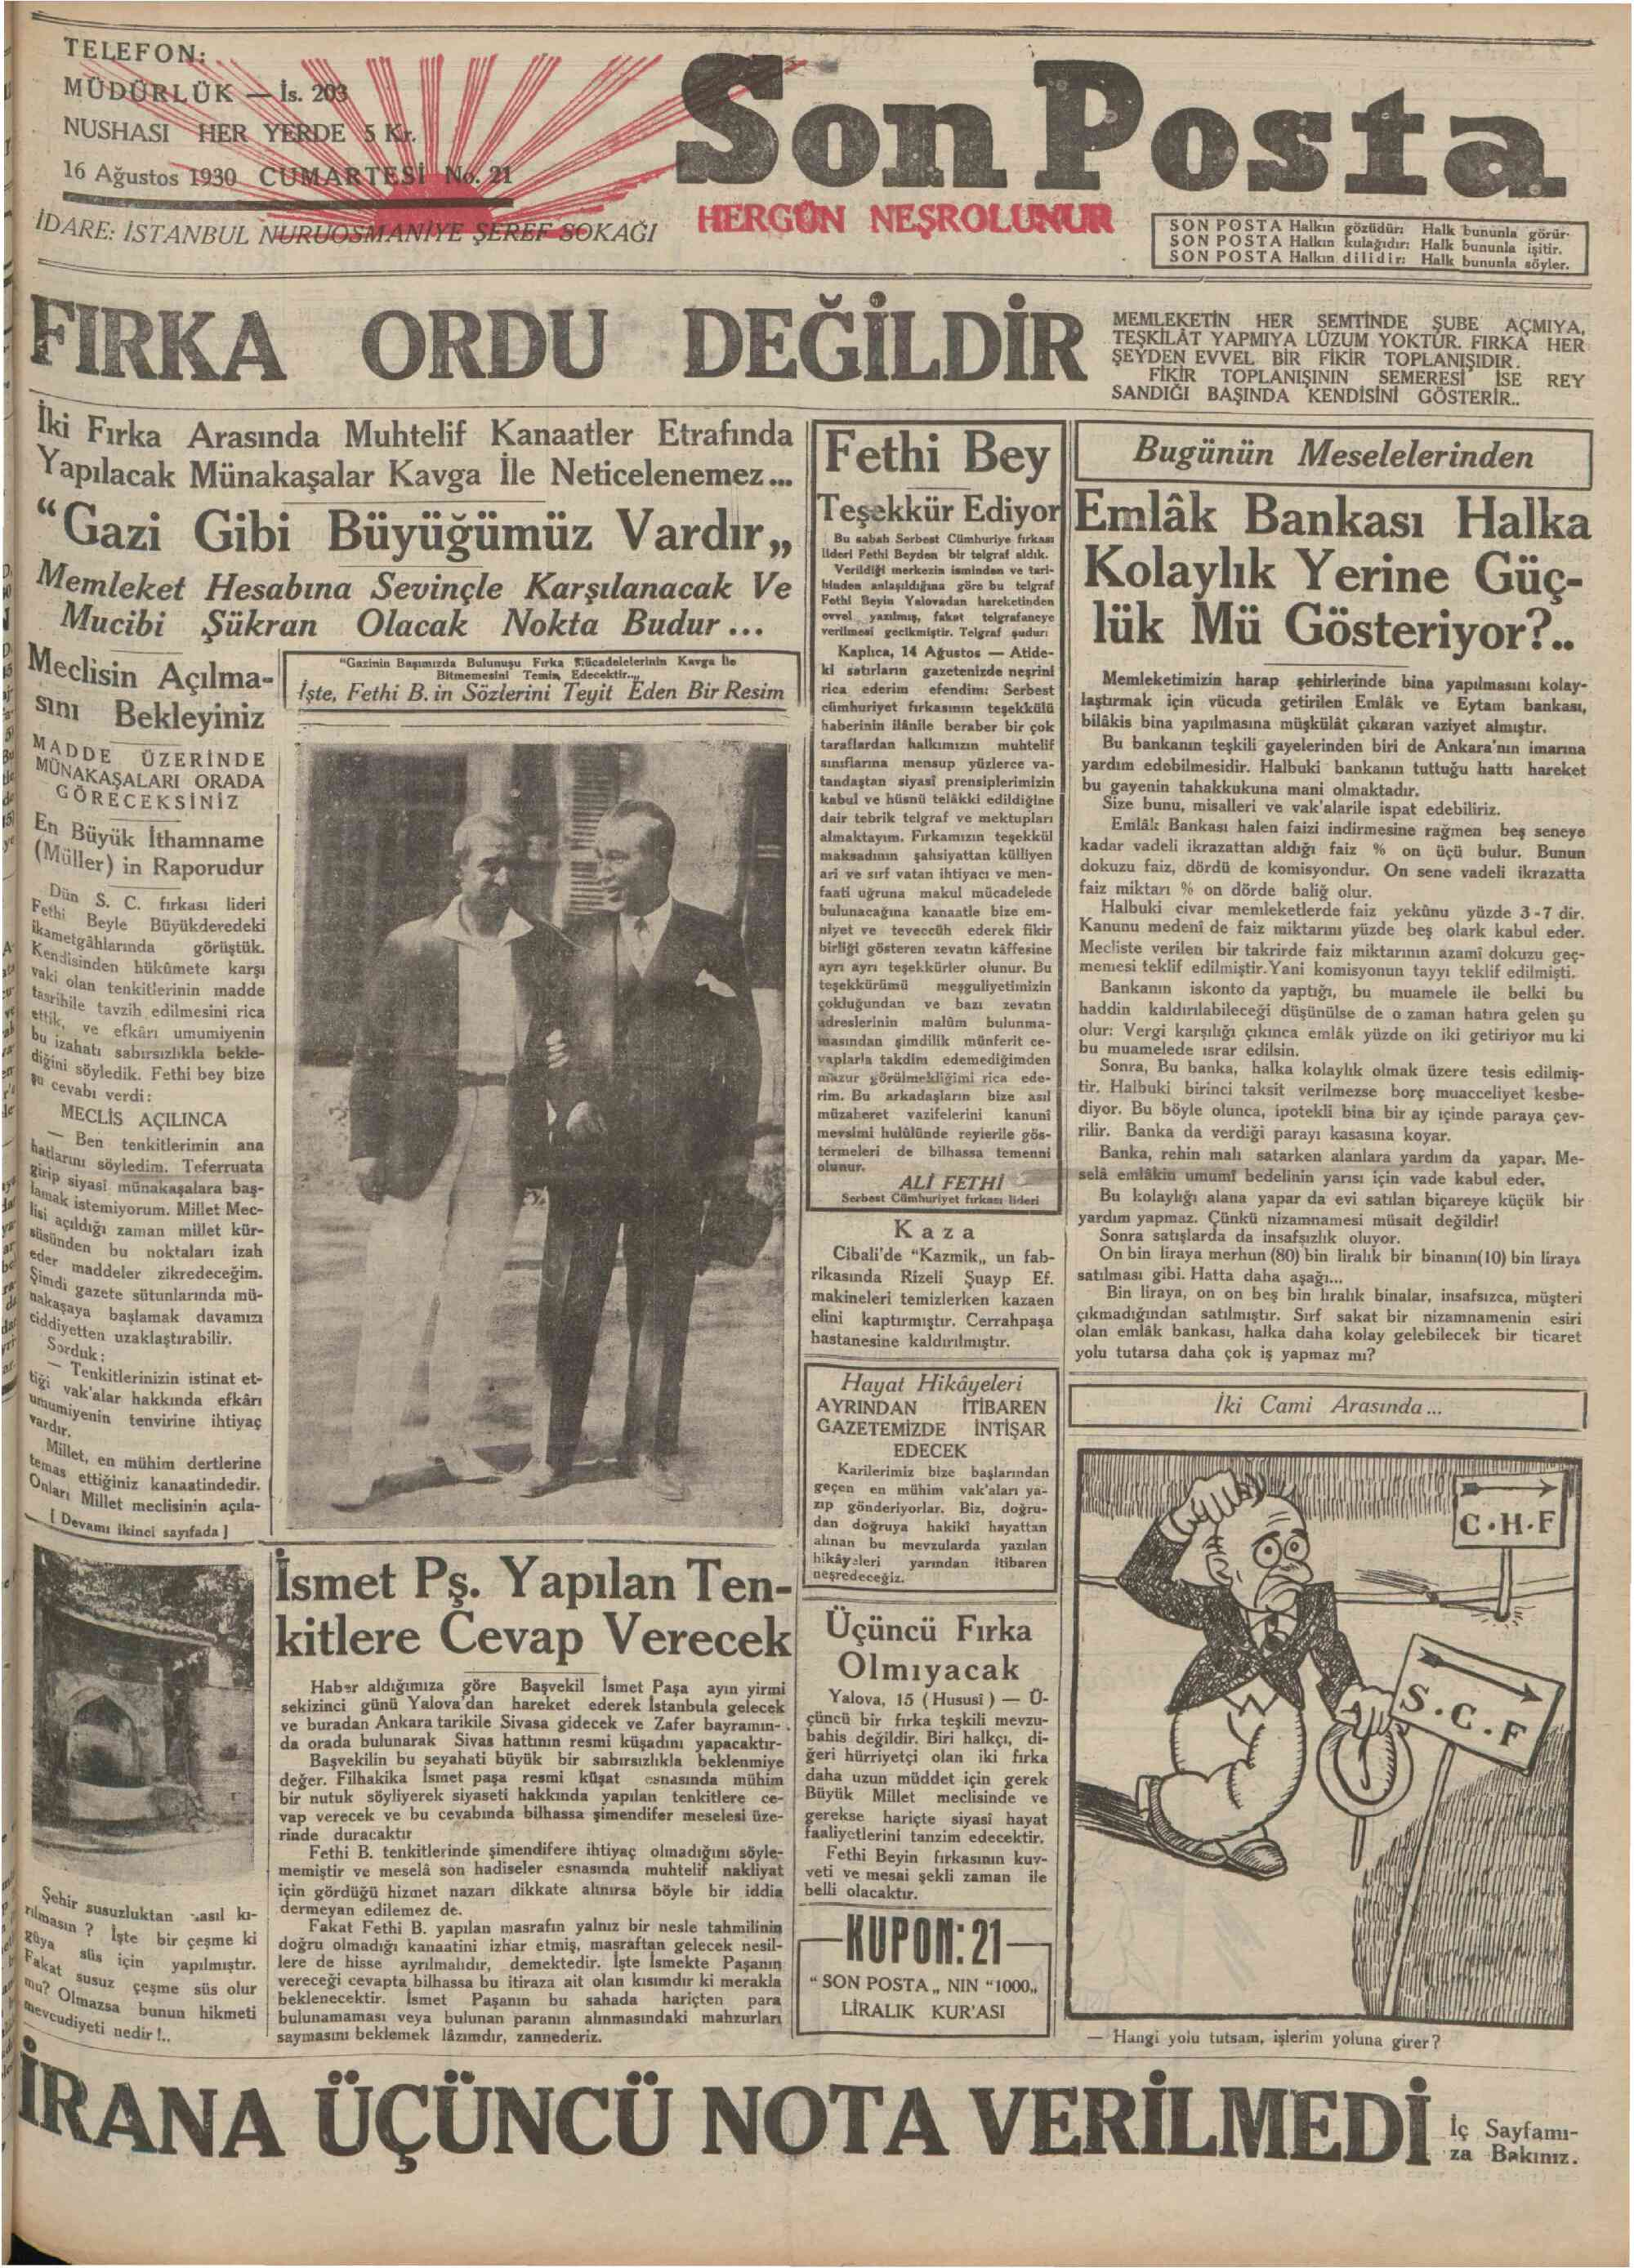 16 Ağustos 1930 Tarihli Son Posta Gazetesi Sayfa 1